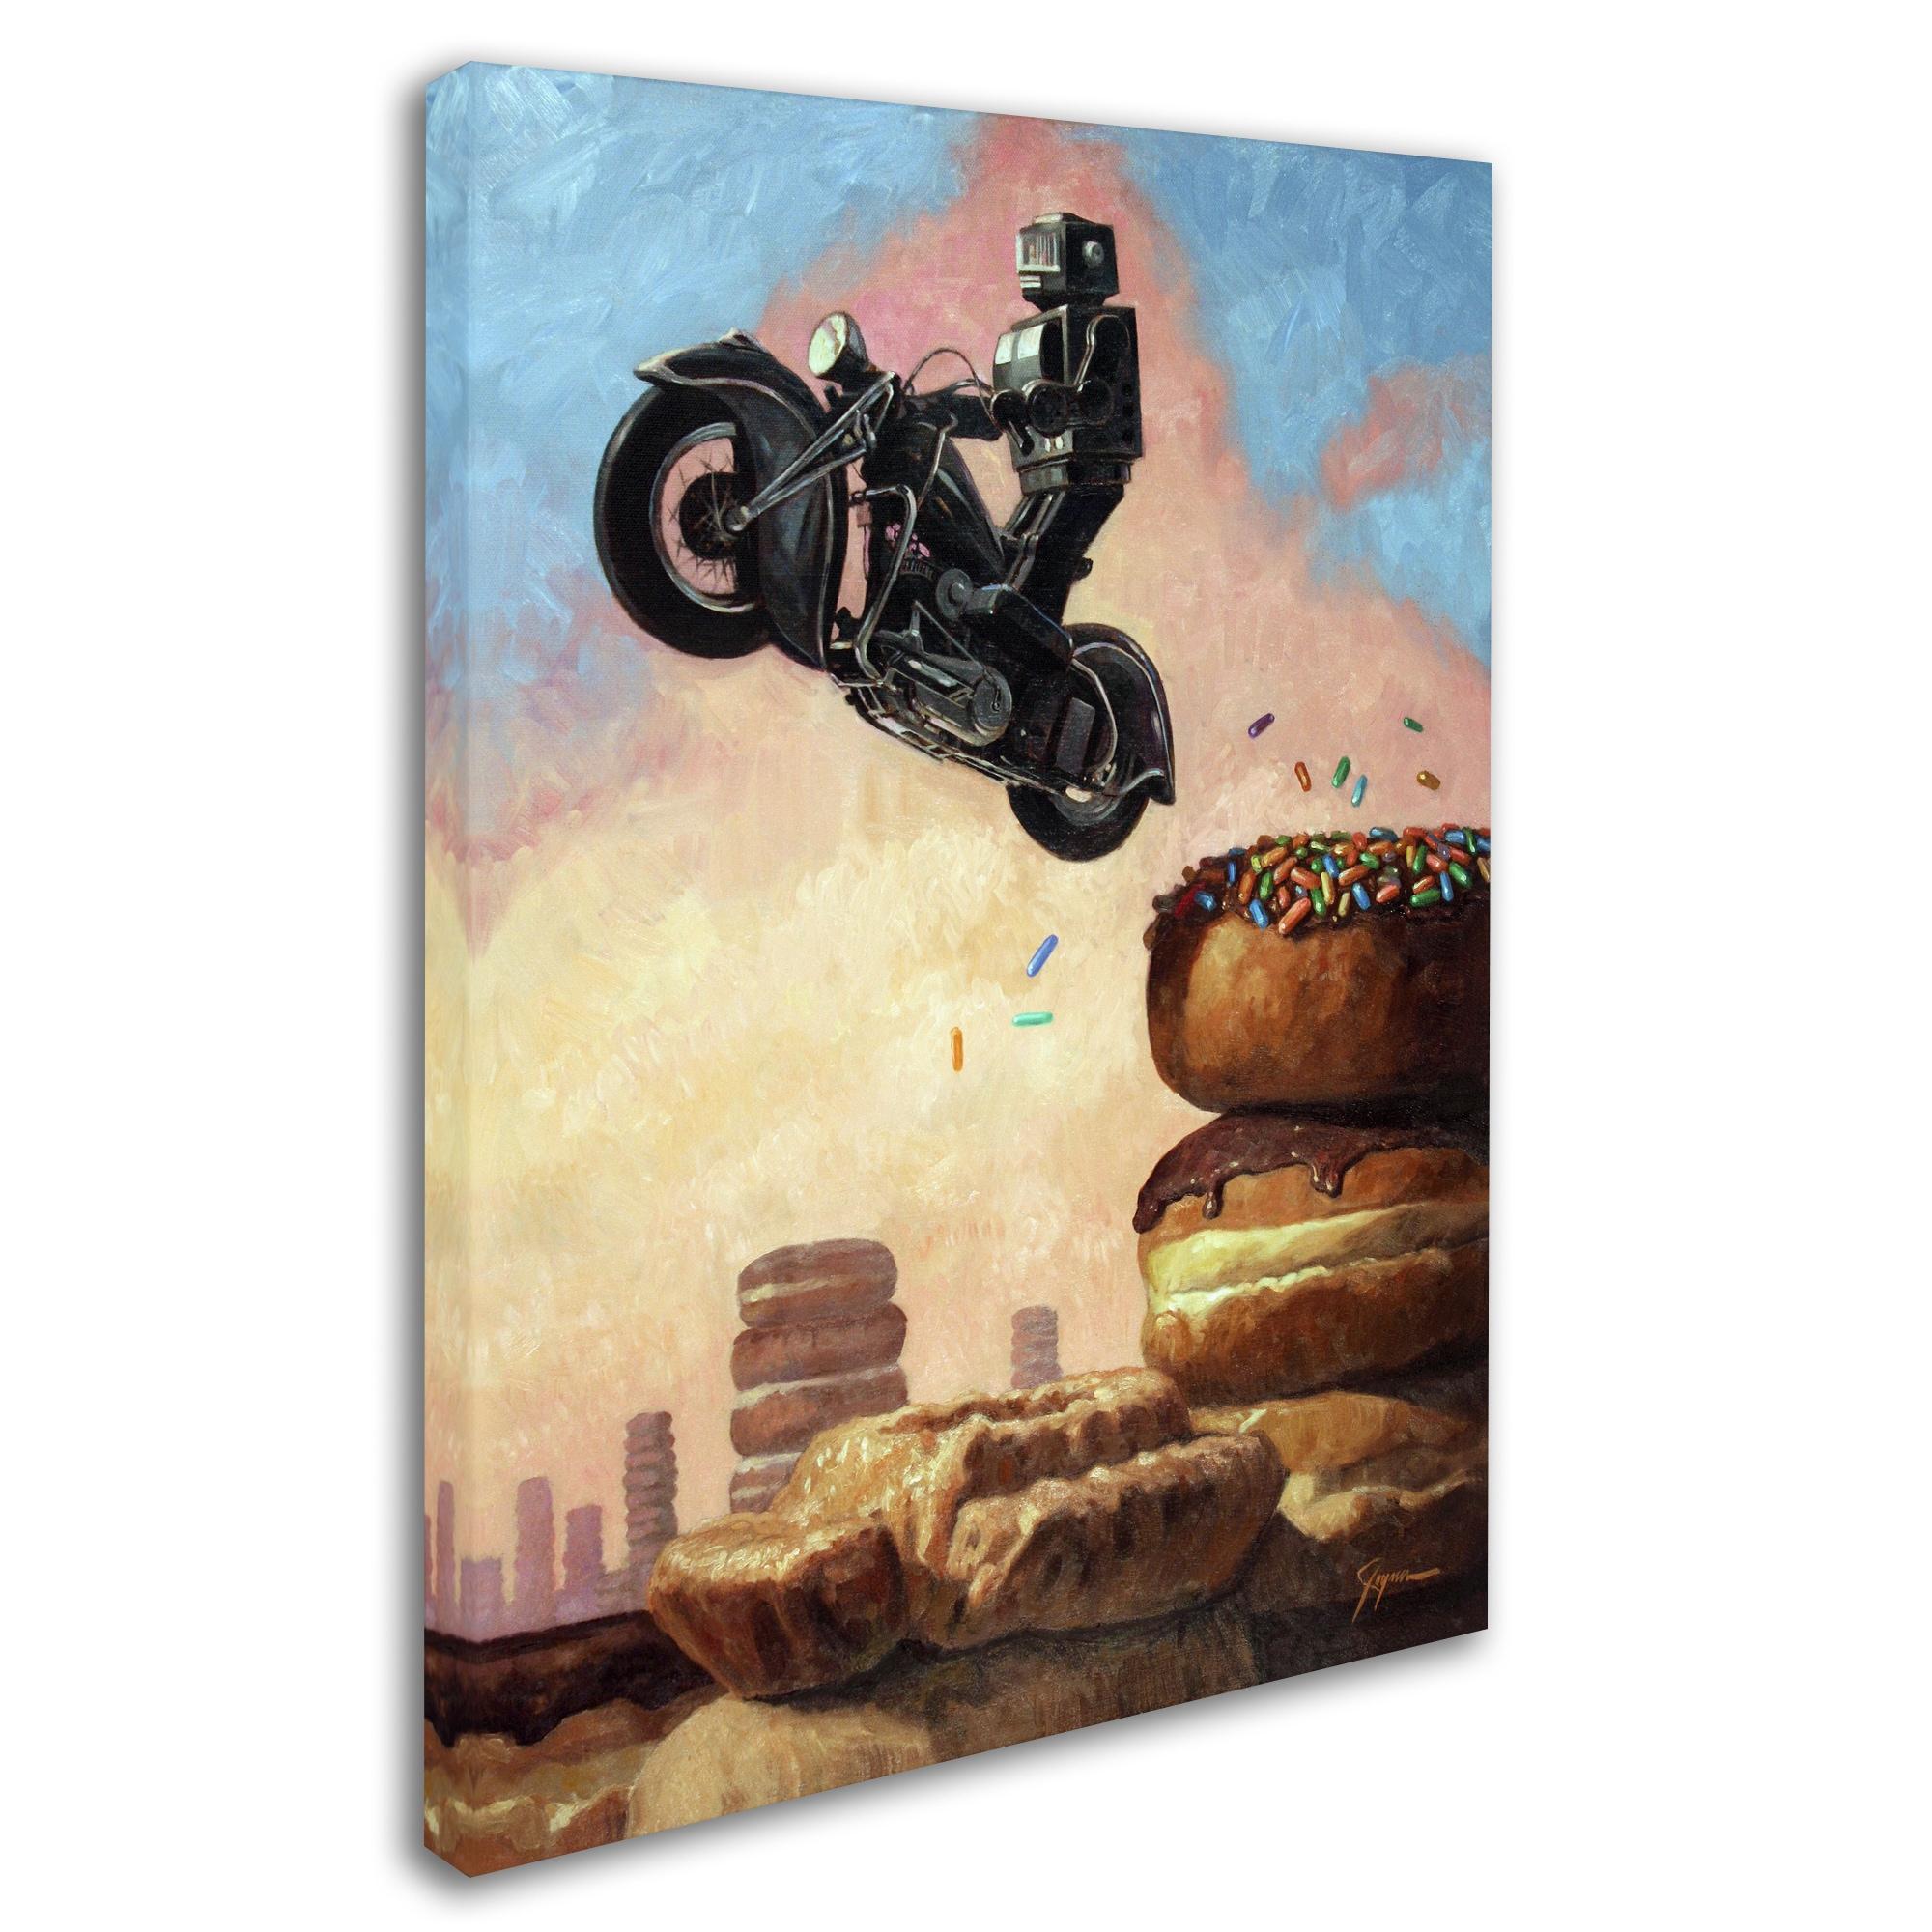 Shop Eric Joyner \'Dark Rider Again\' Canvas Wall Art - Multi - Free ...